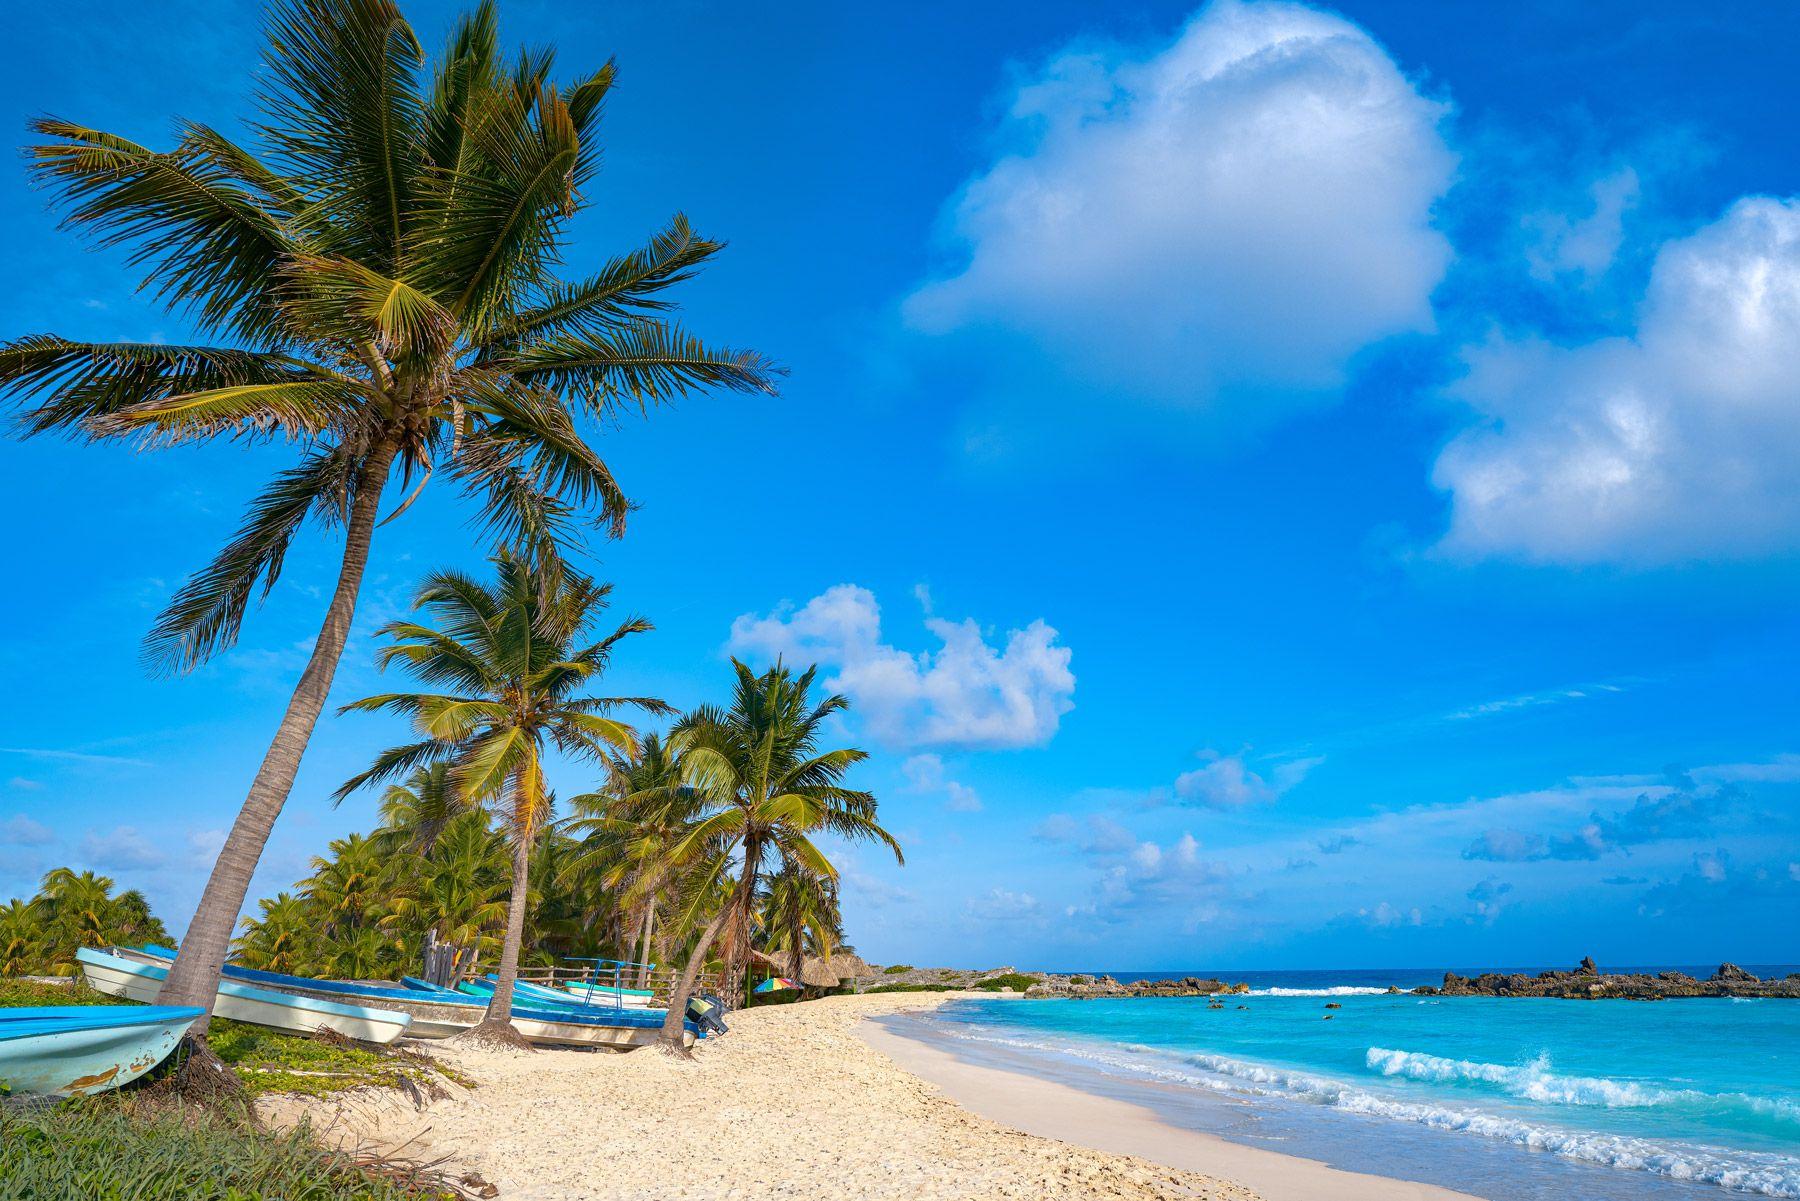 Chen Rio beach Cozumel island Riviera Maya